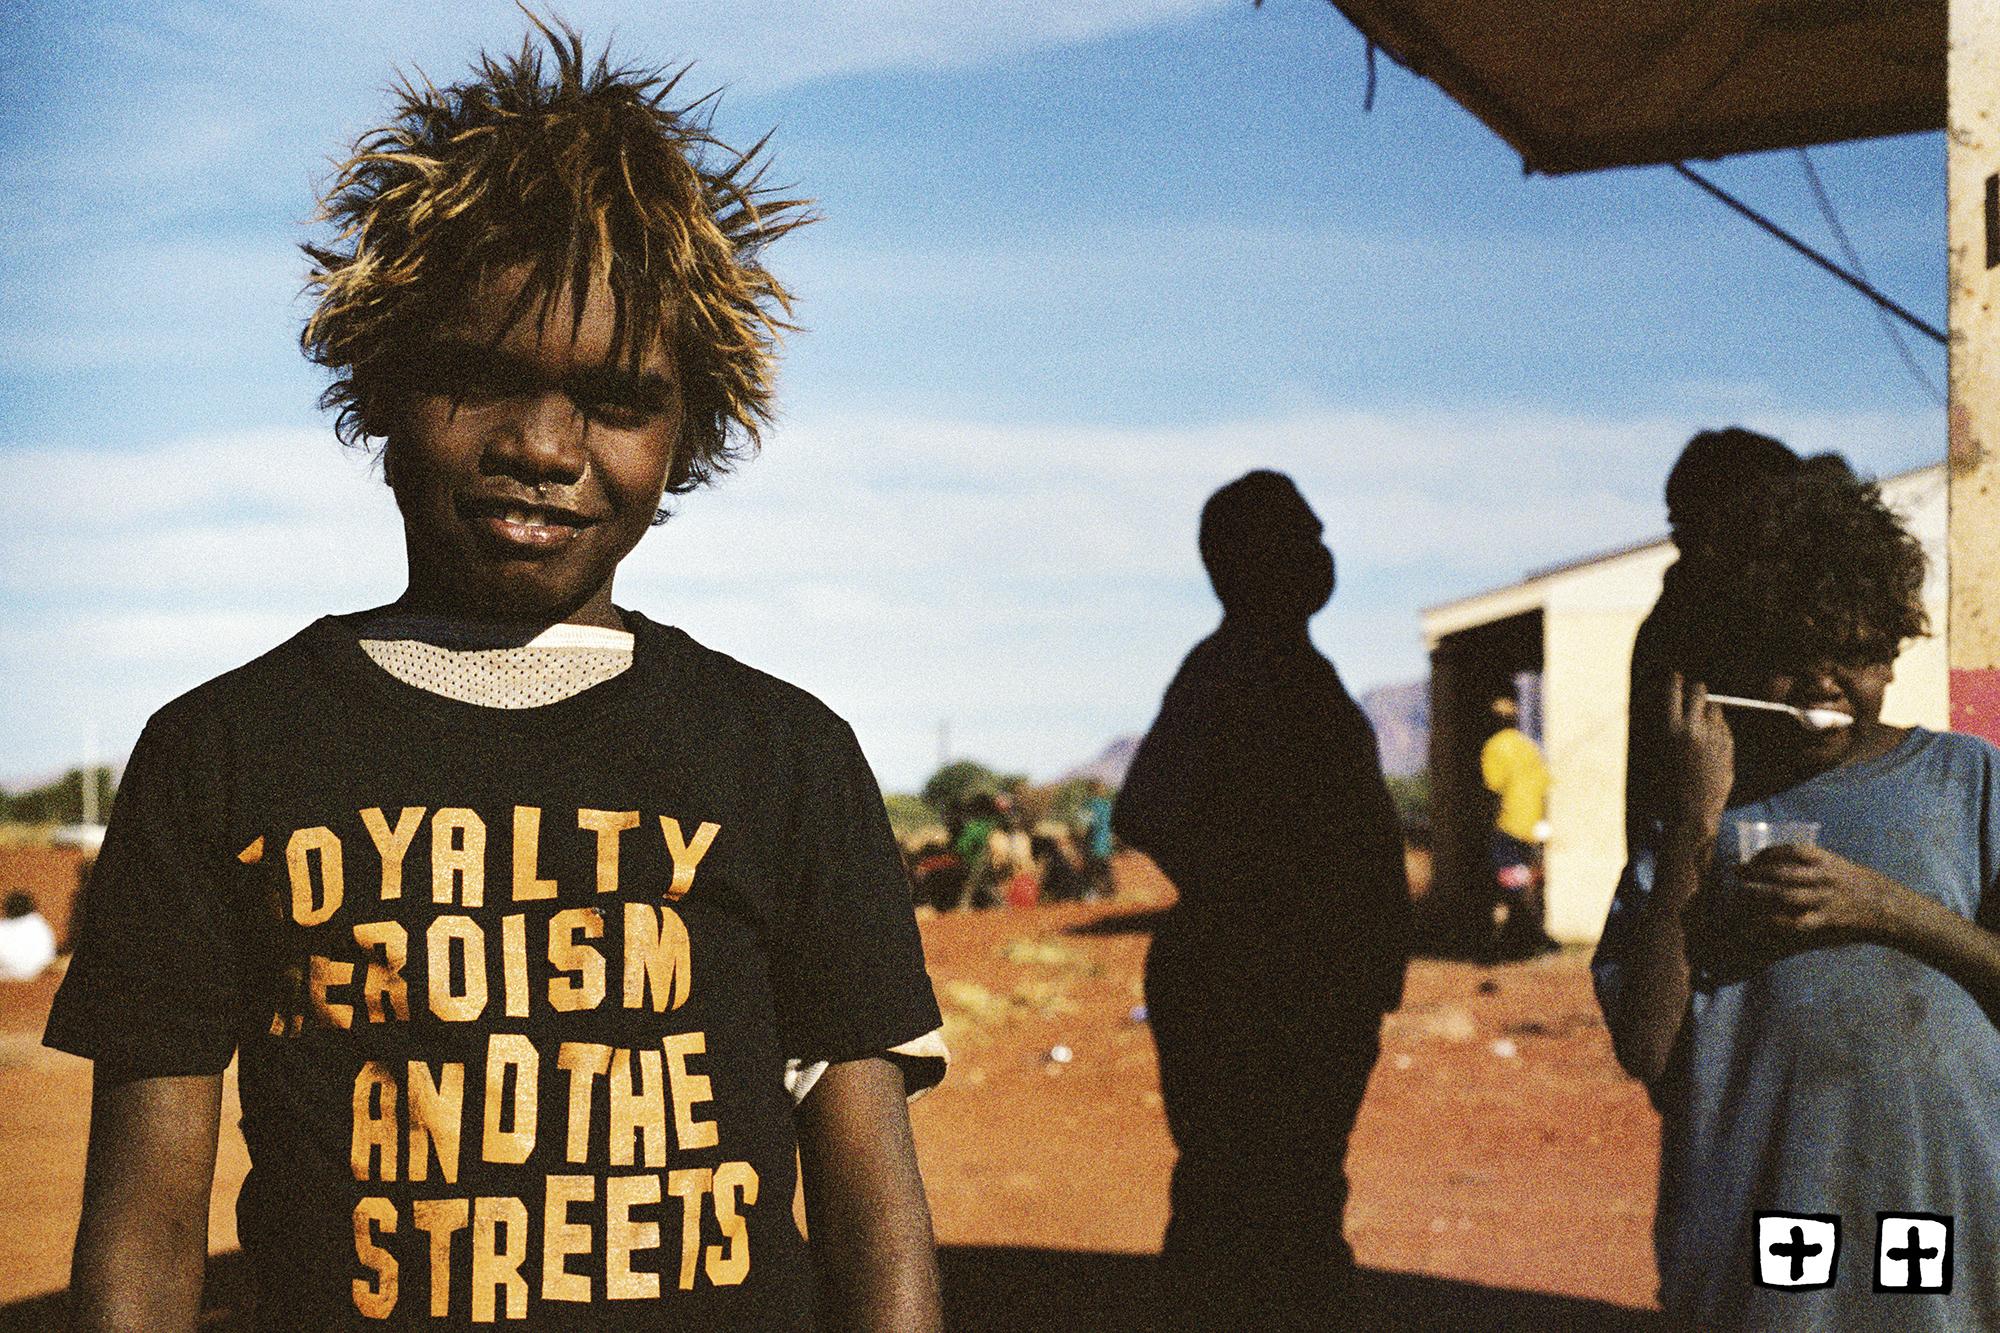 Ksubi-Aboriginal-boy-.jpg